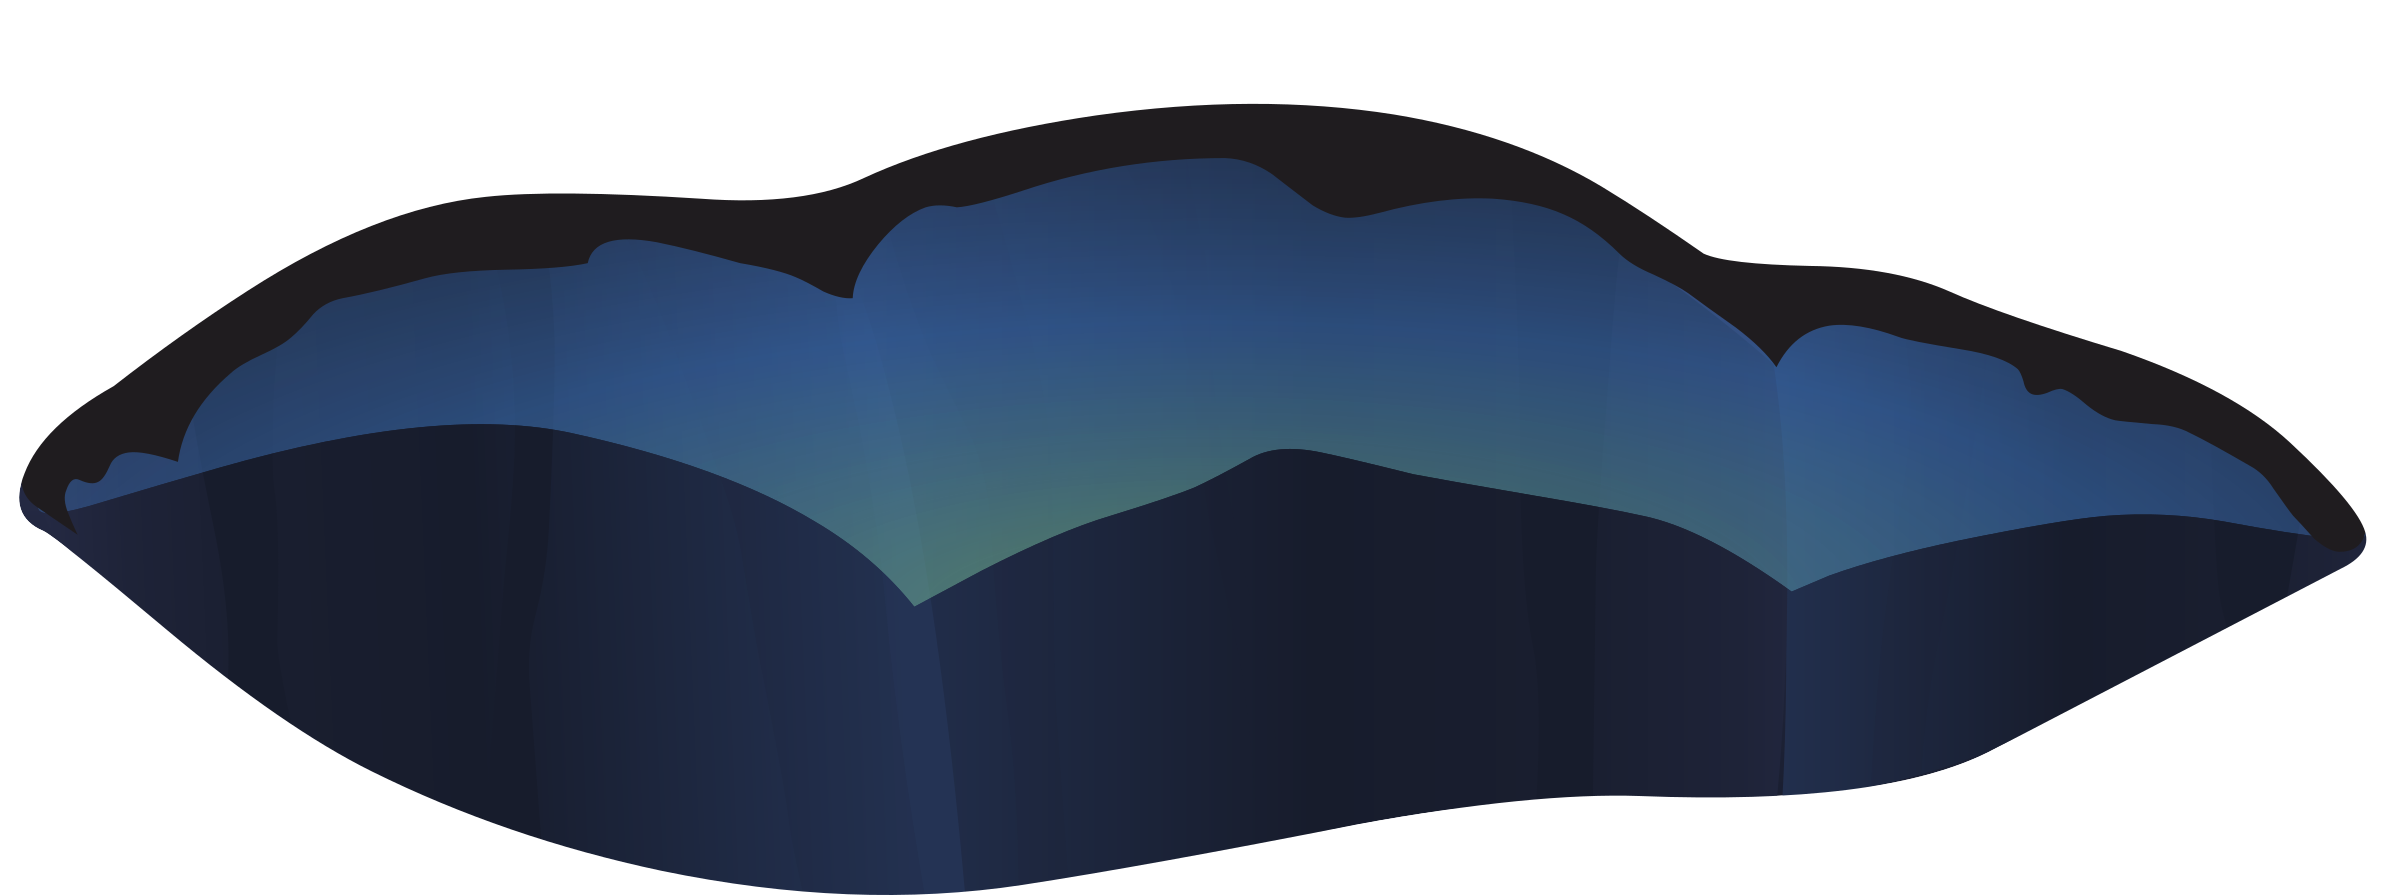 Ilmenskie cave gr icons. Hole clipart big